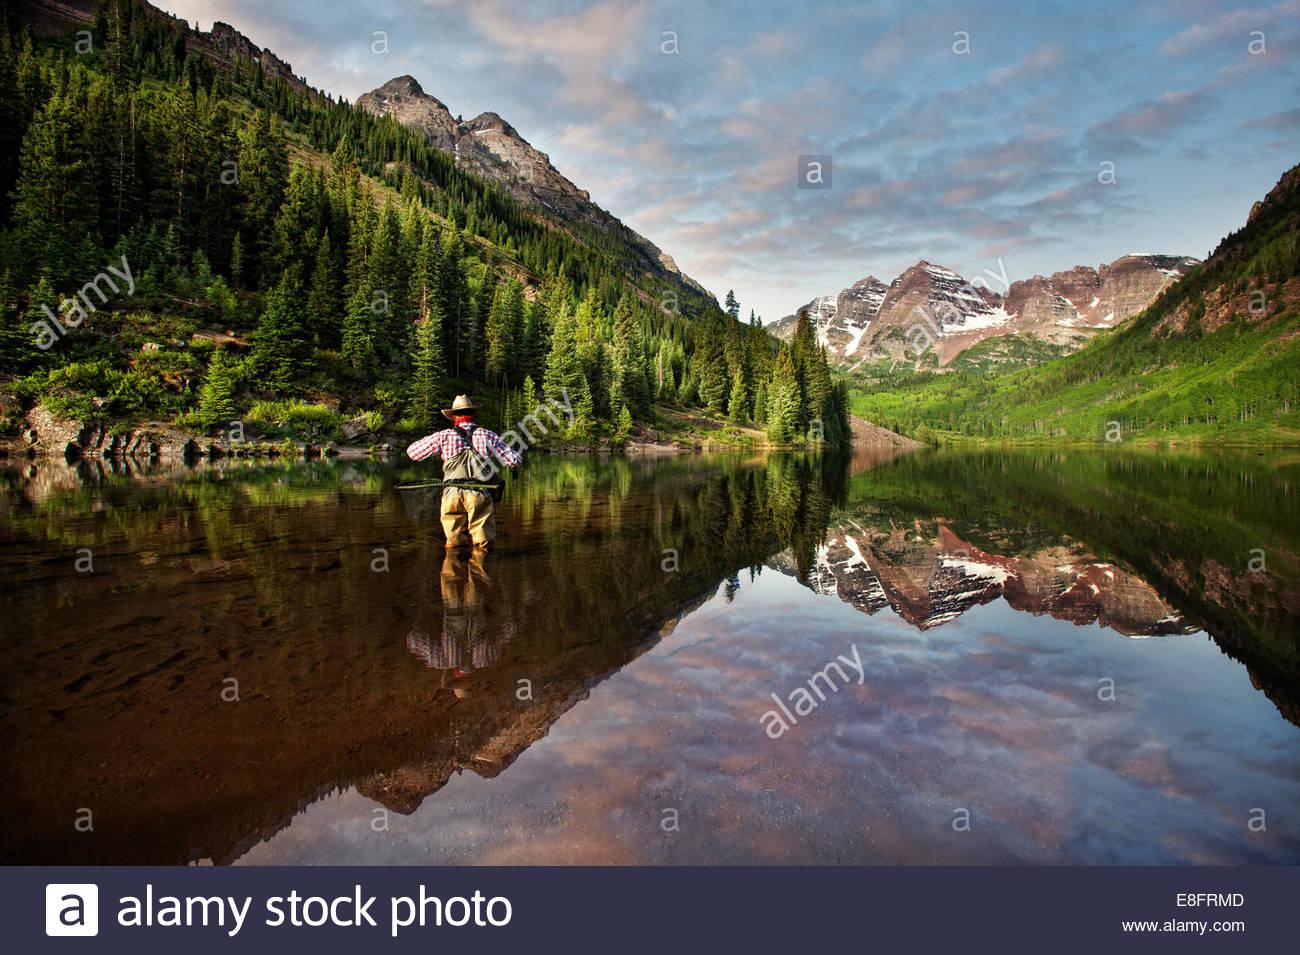 Fly fisherman angling in Maroon Lake, Colorado, America, USA - Stock Image